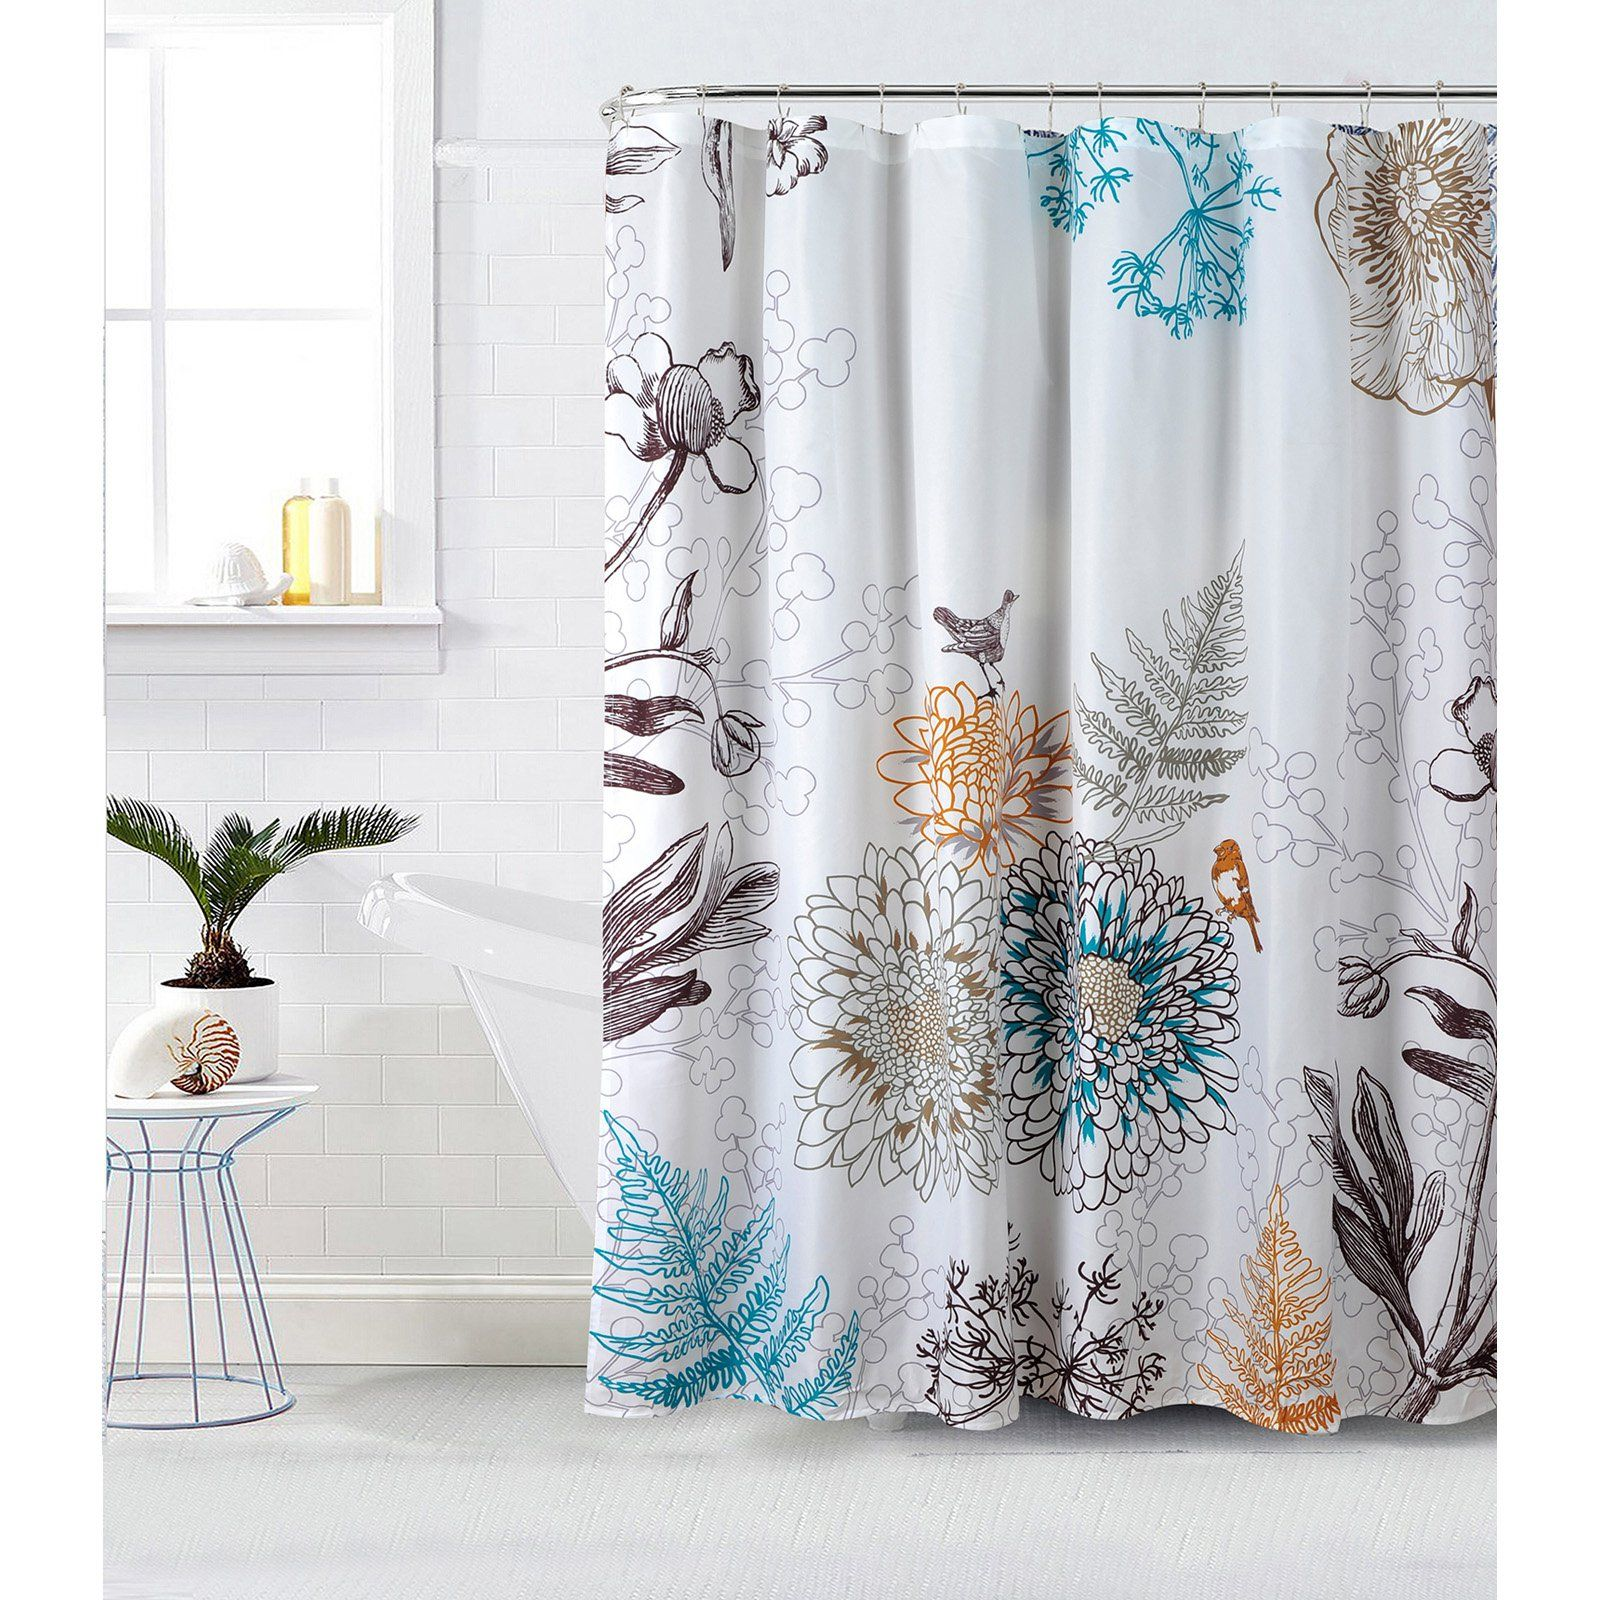 Style Quarters Birdie Shower Curtain White Multicolor Bird